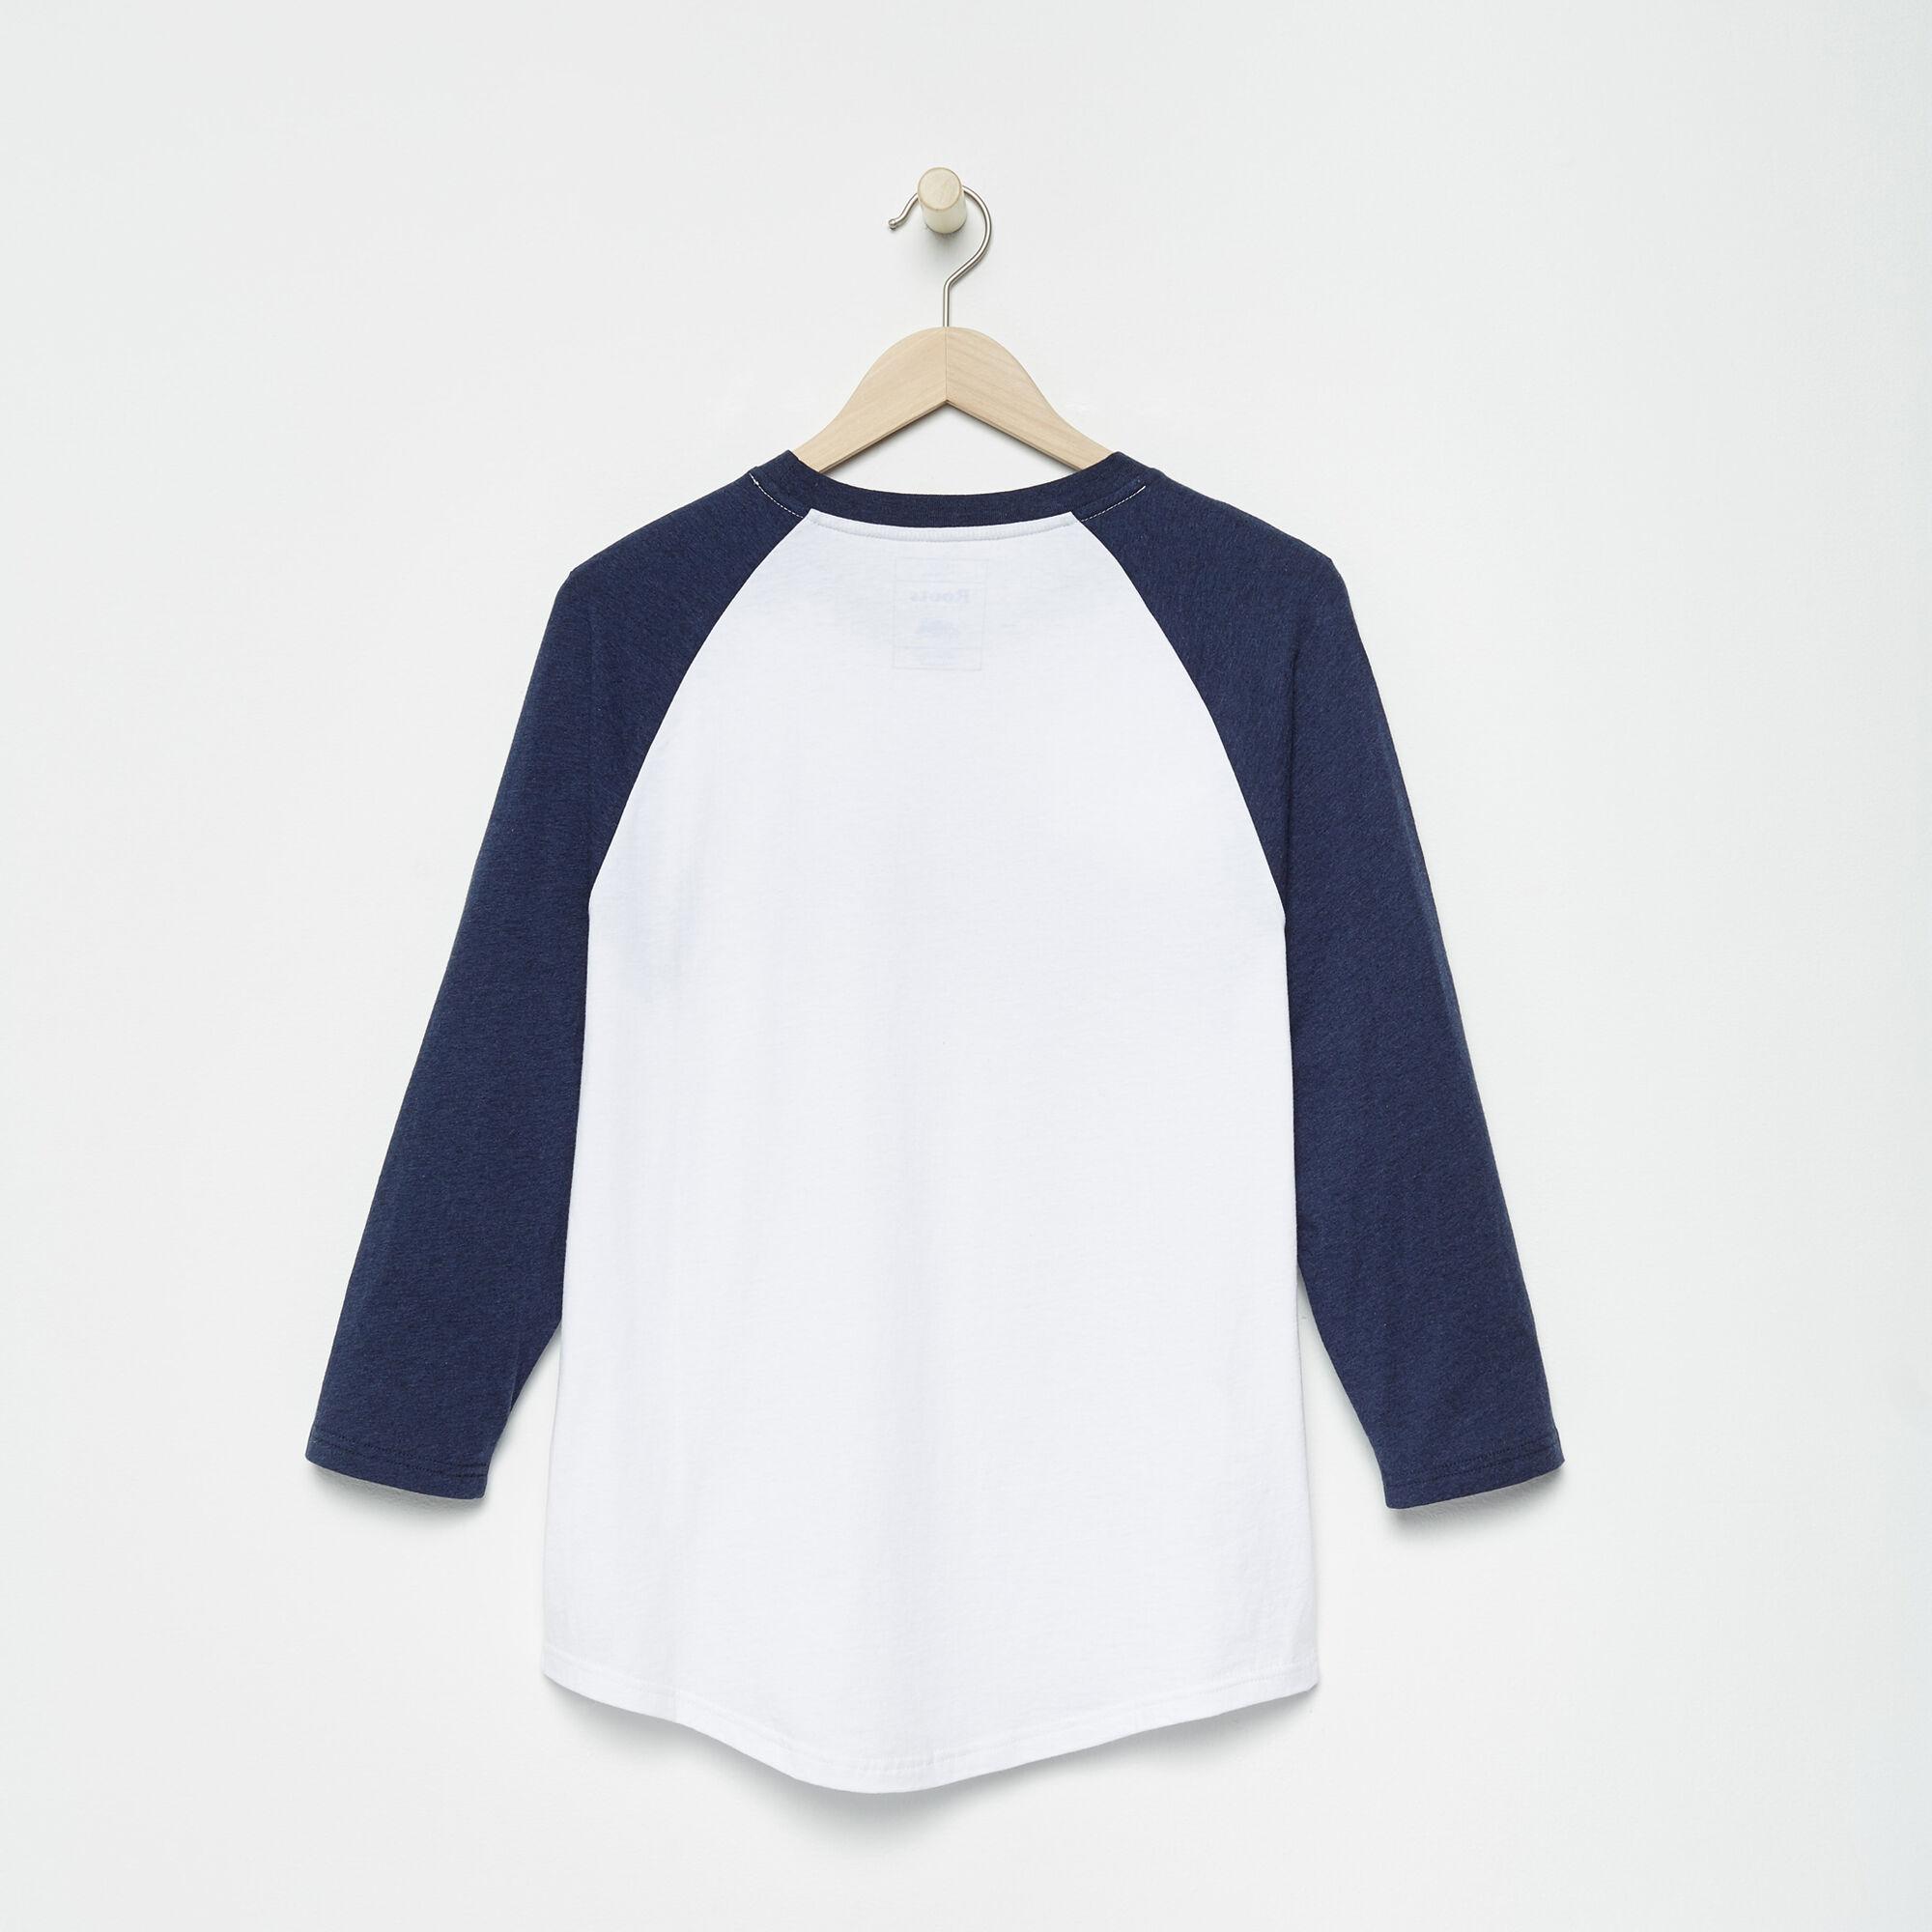 T-shirt de baseball Blue JaysMC Ballpark pour hommes